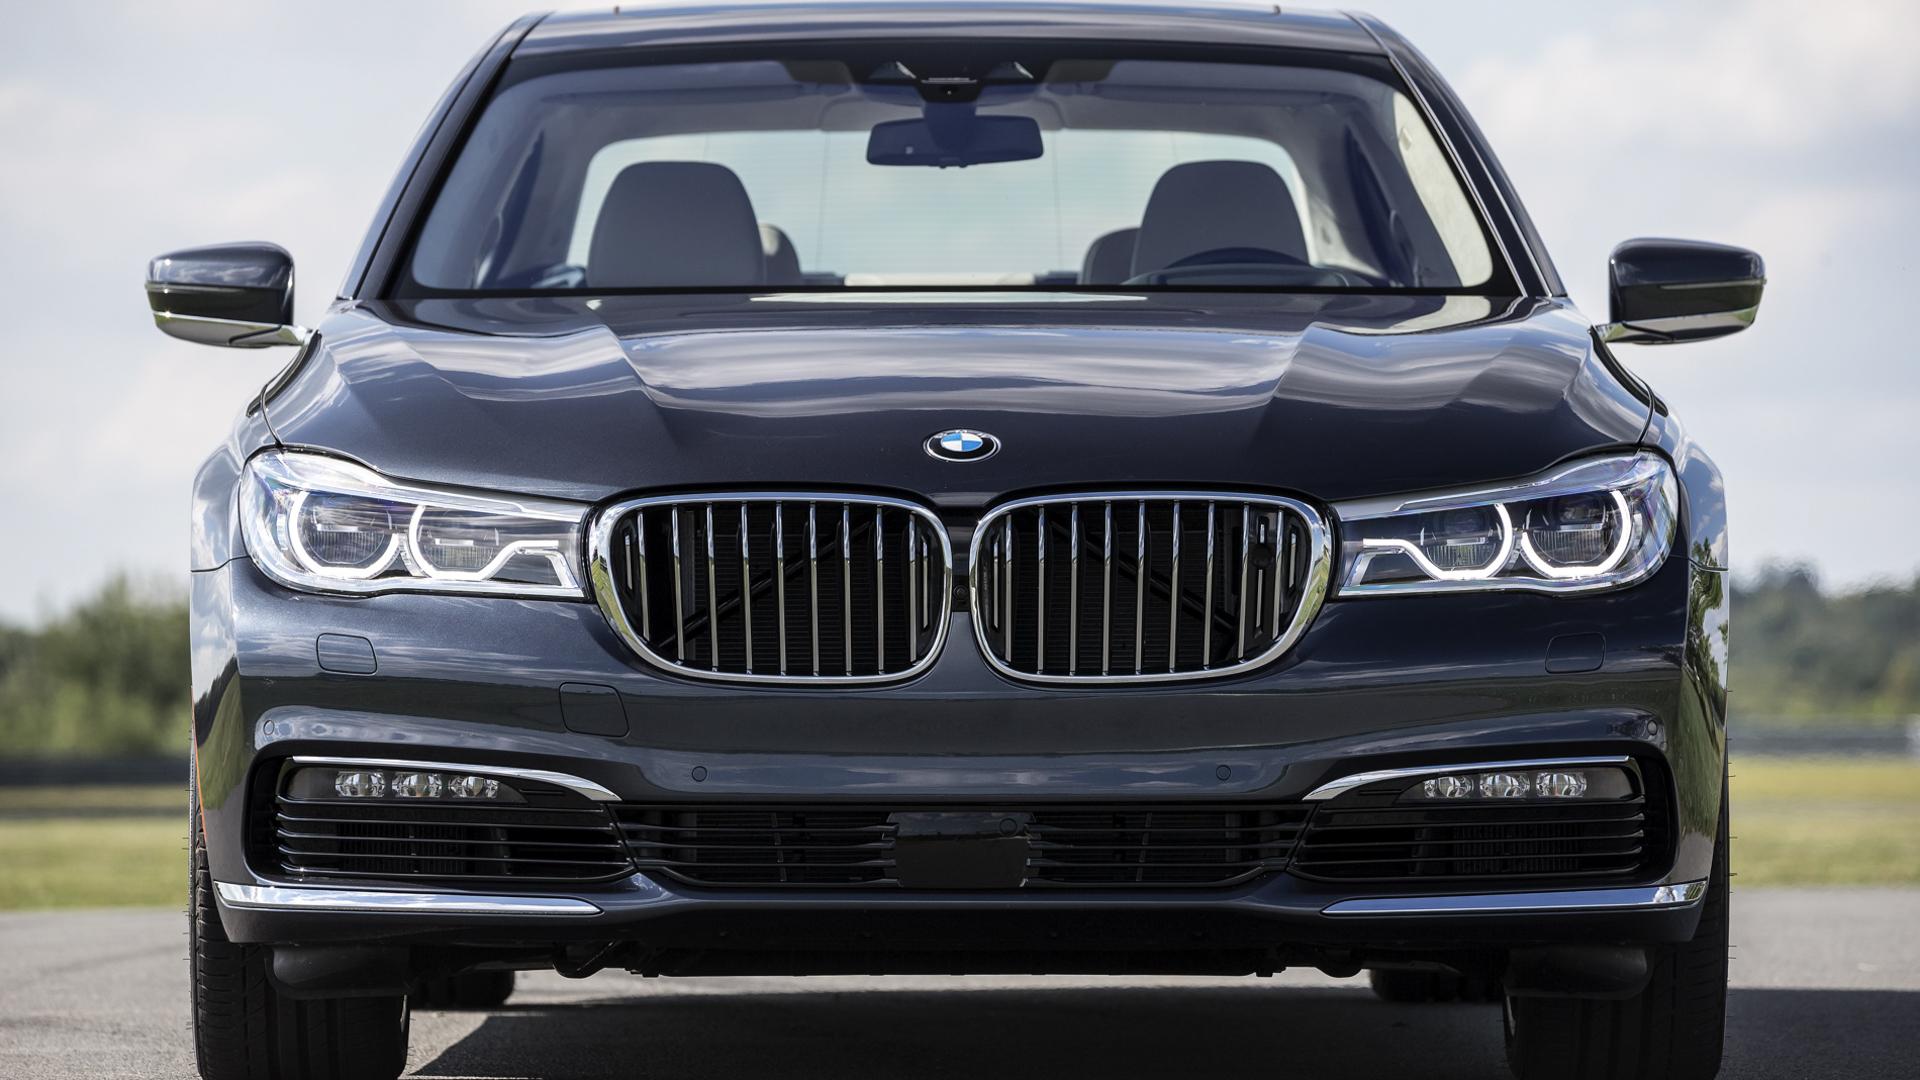 BMW 7 Series LCI vs Pre LCI 8 of 14